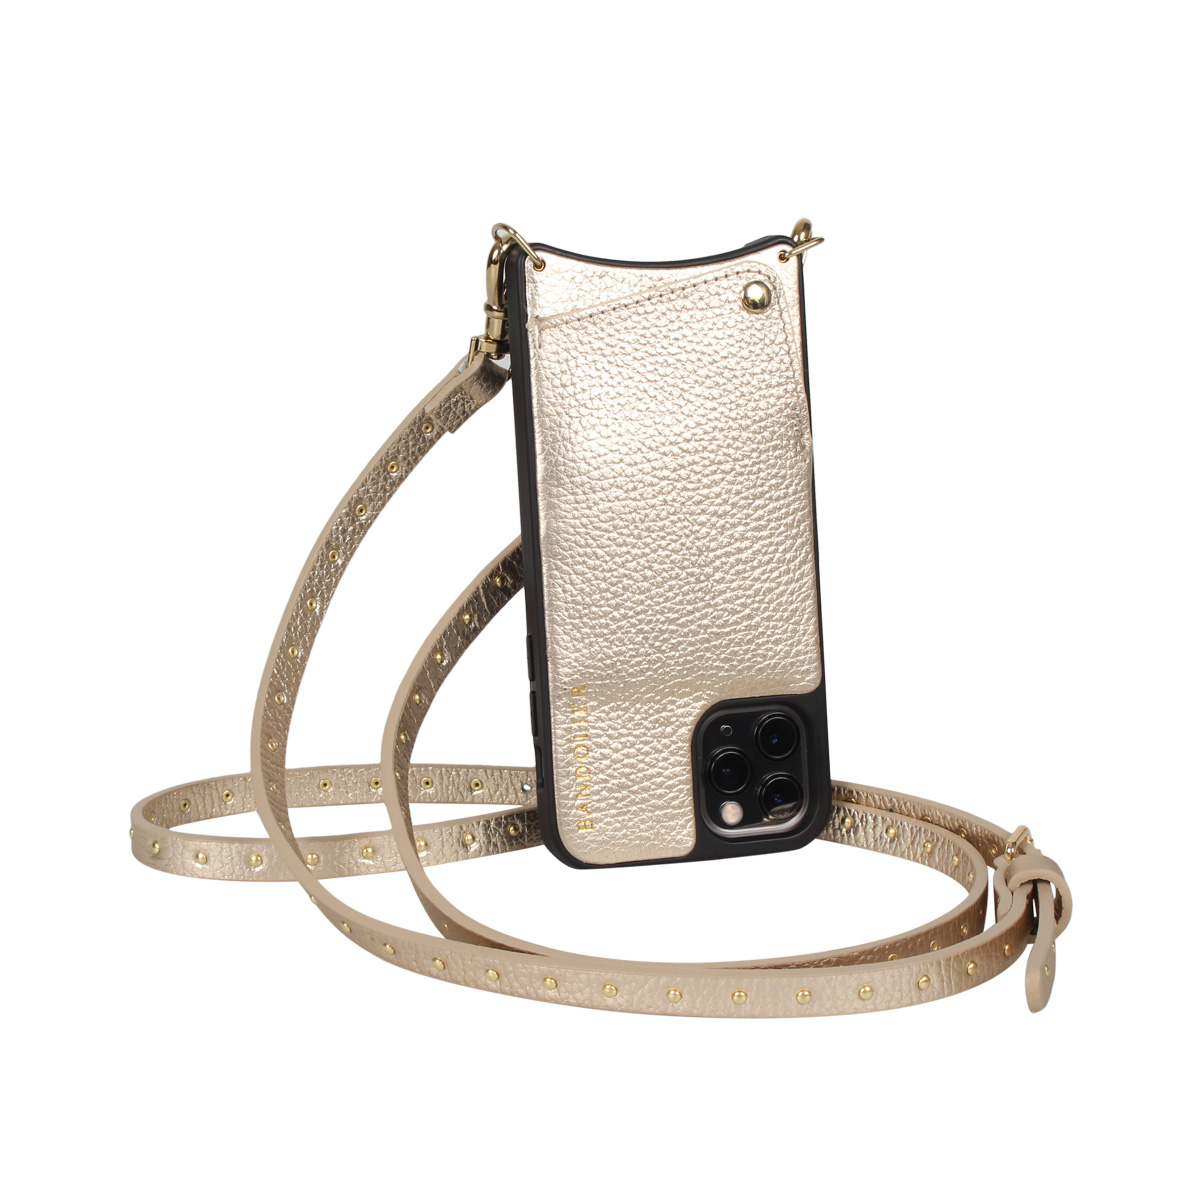 BANDOLIER NICOLE RICH GOLD バンドリヤー iPhone11 Proケース スマホ 携帯 ショルダー アイフォン メンズ レディース レザー ゴールド 10NIC